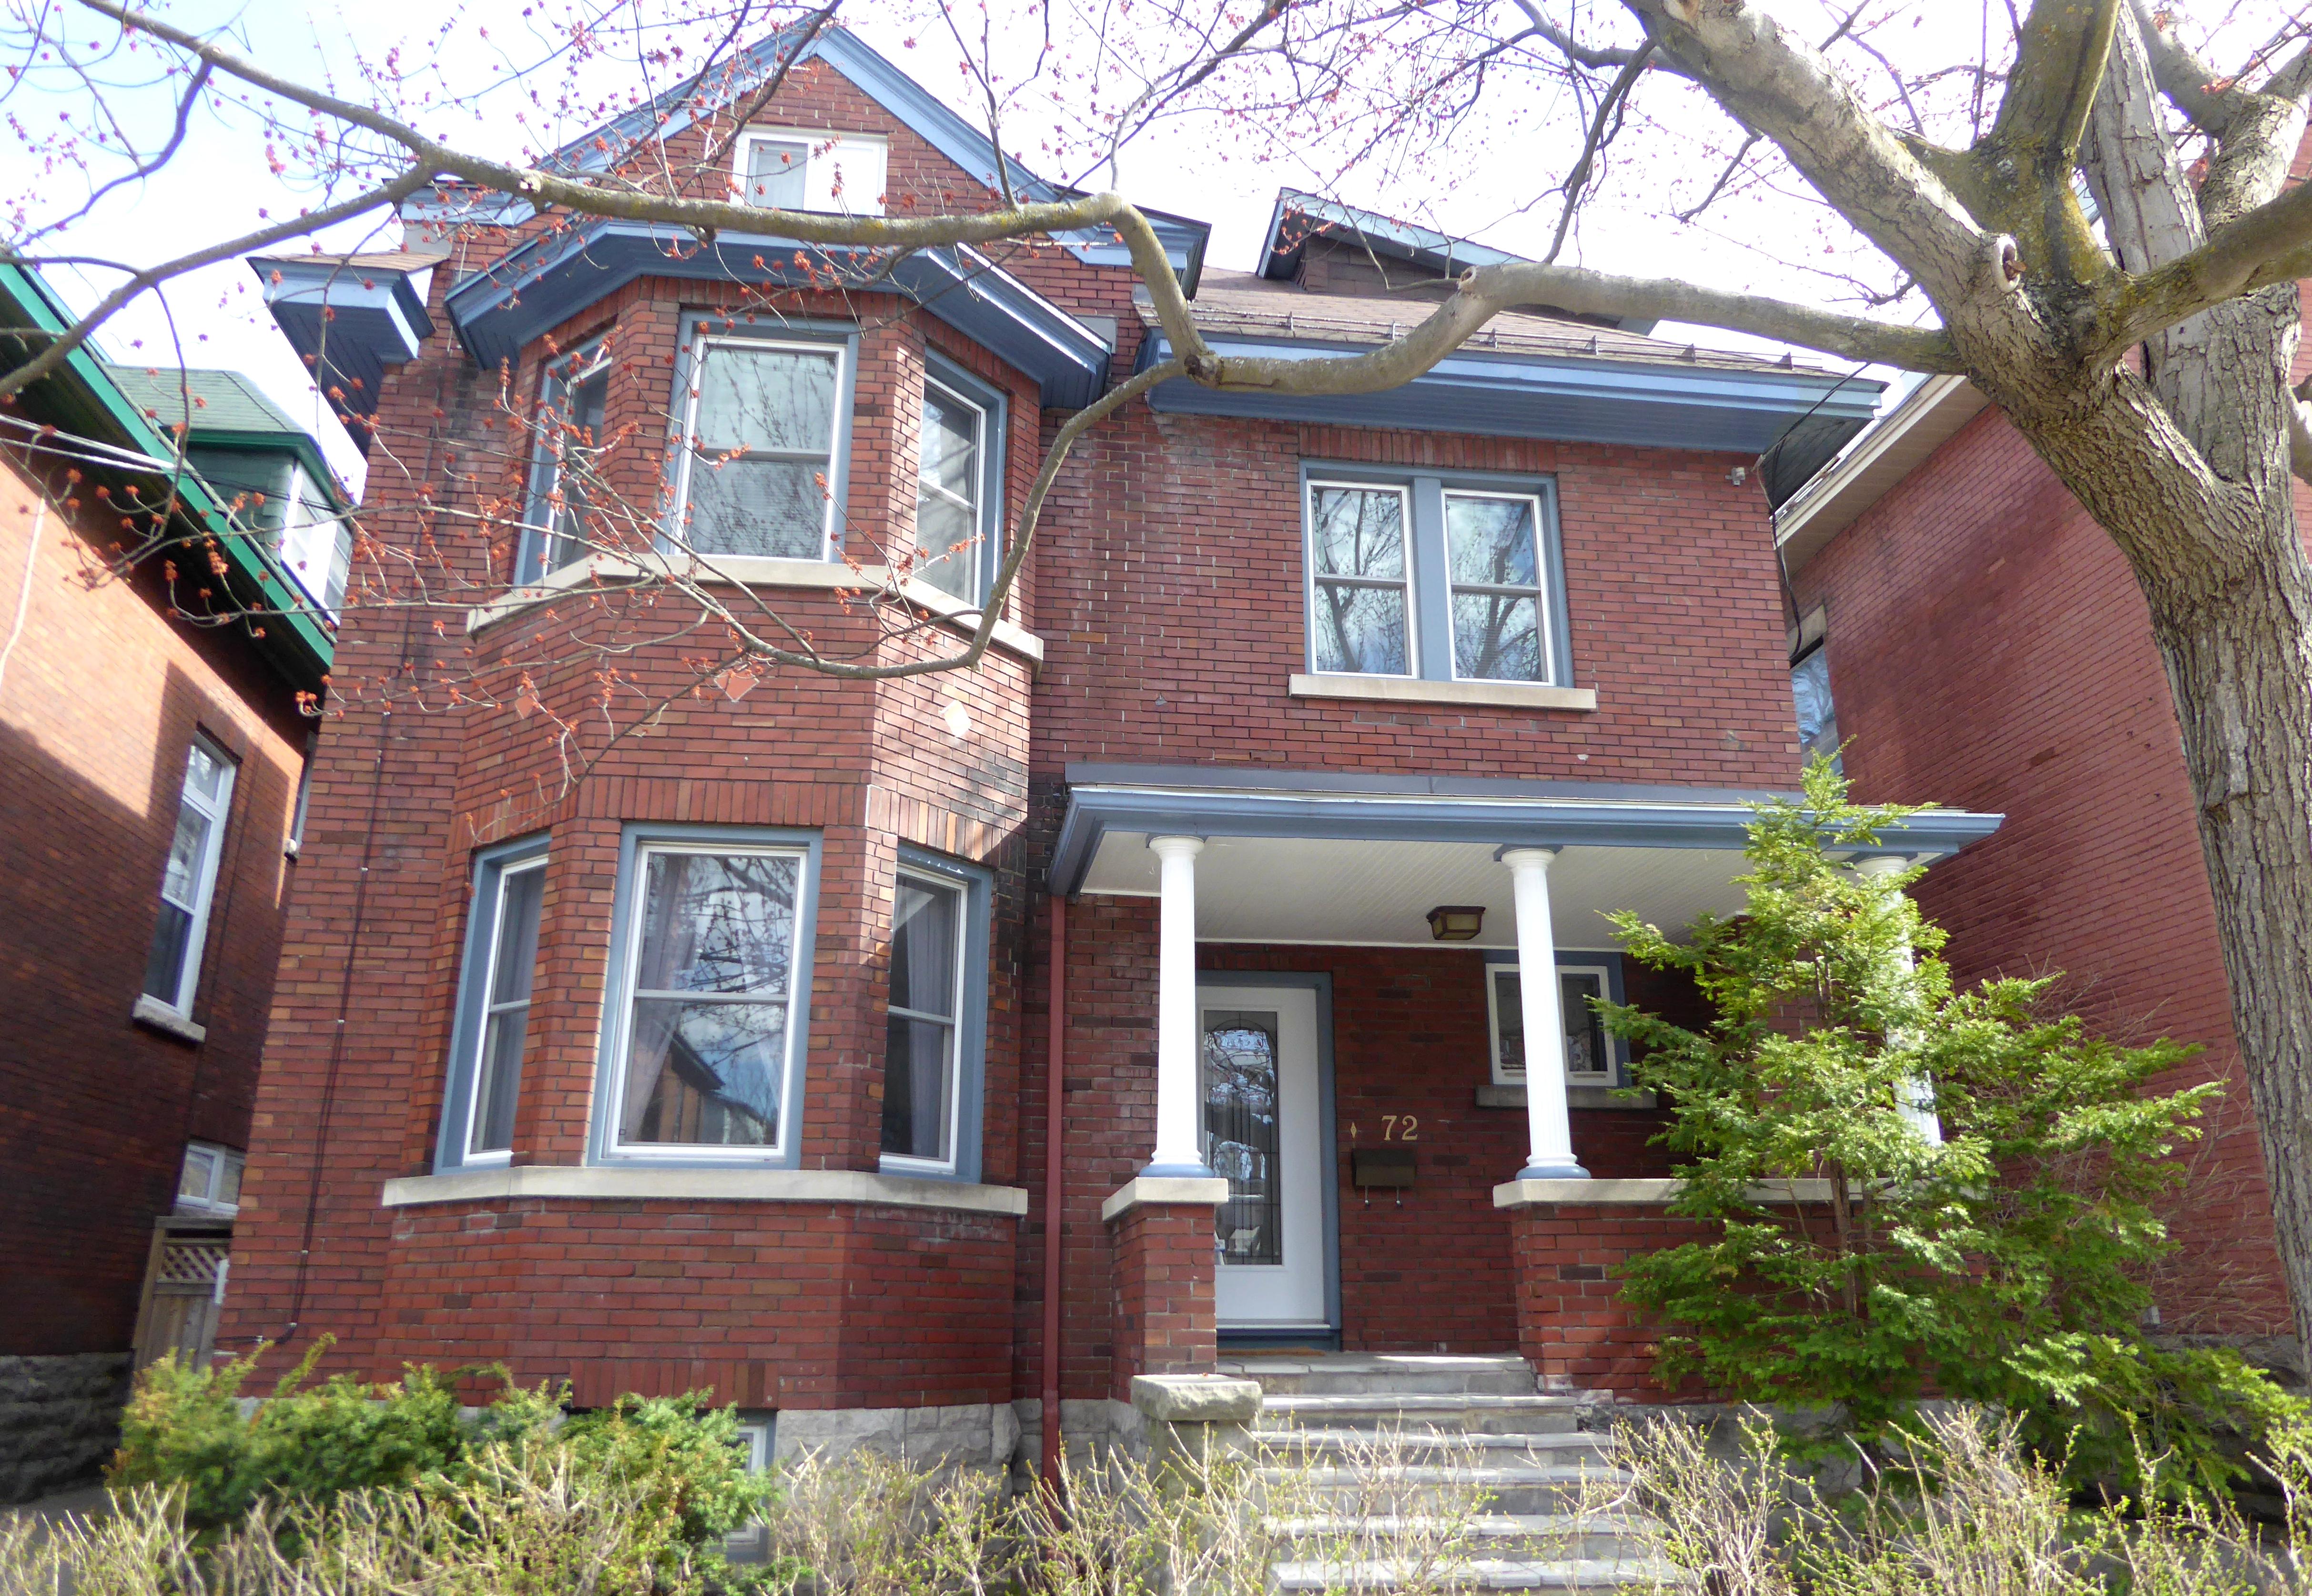 72 Delaware Ave – Sold June 2015